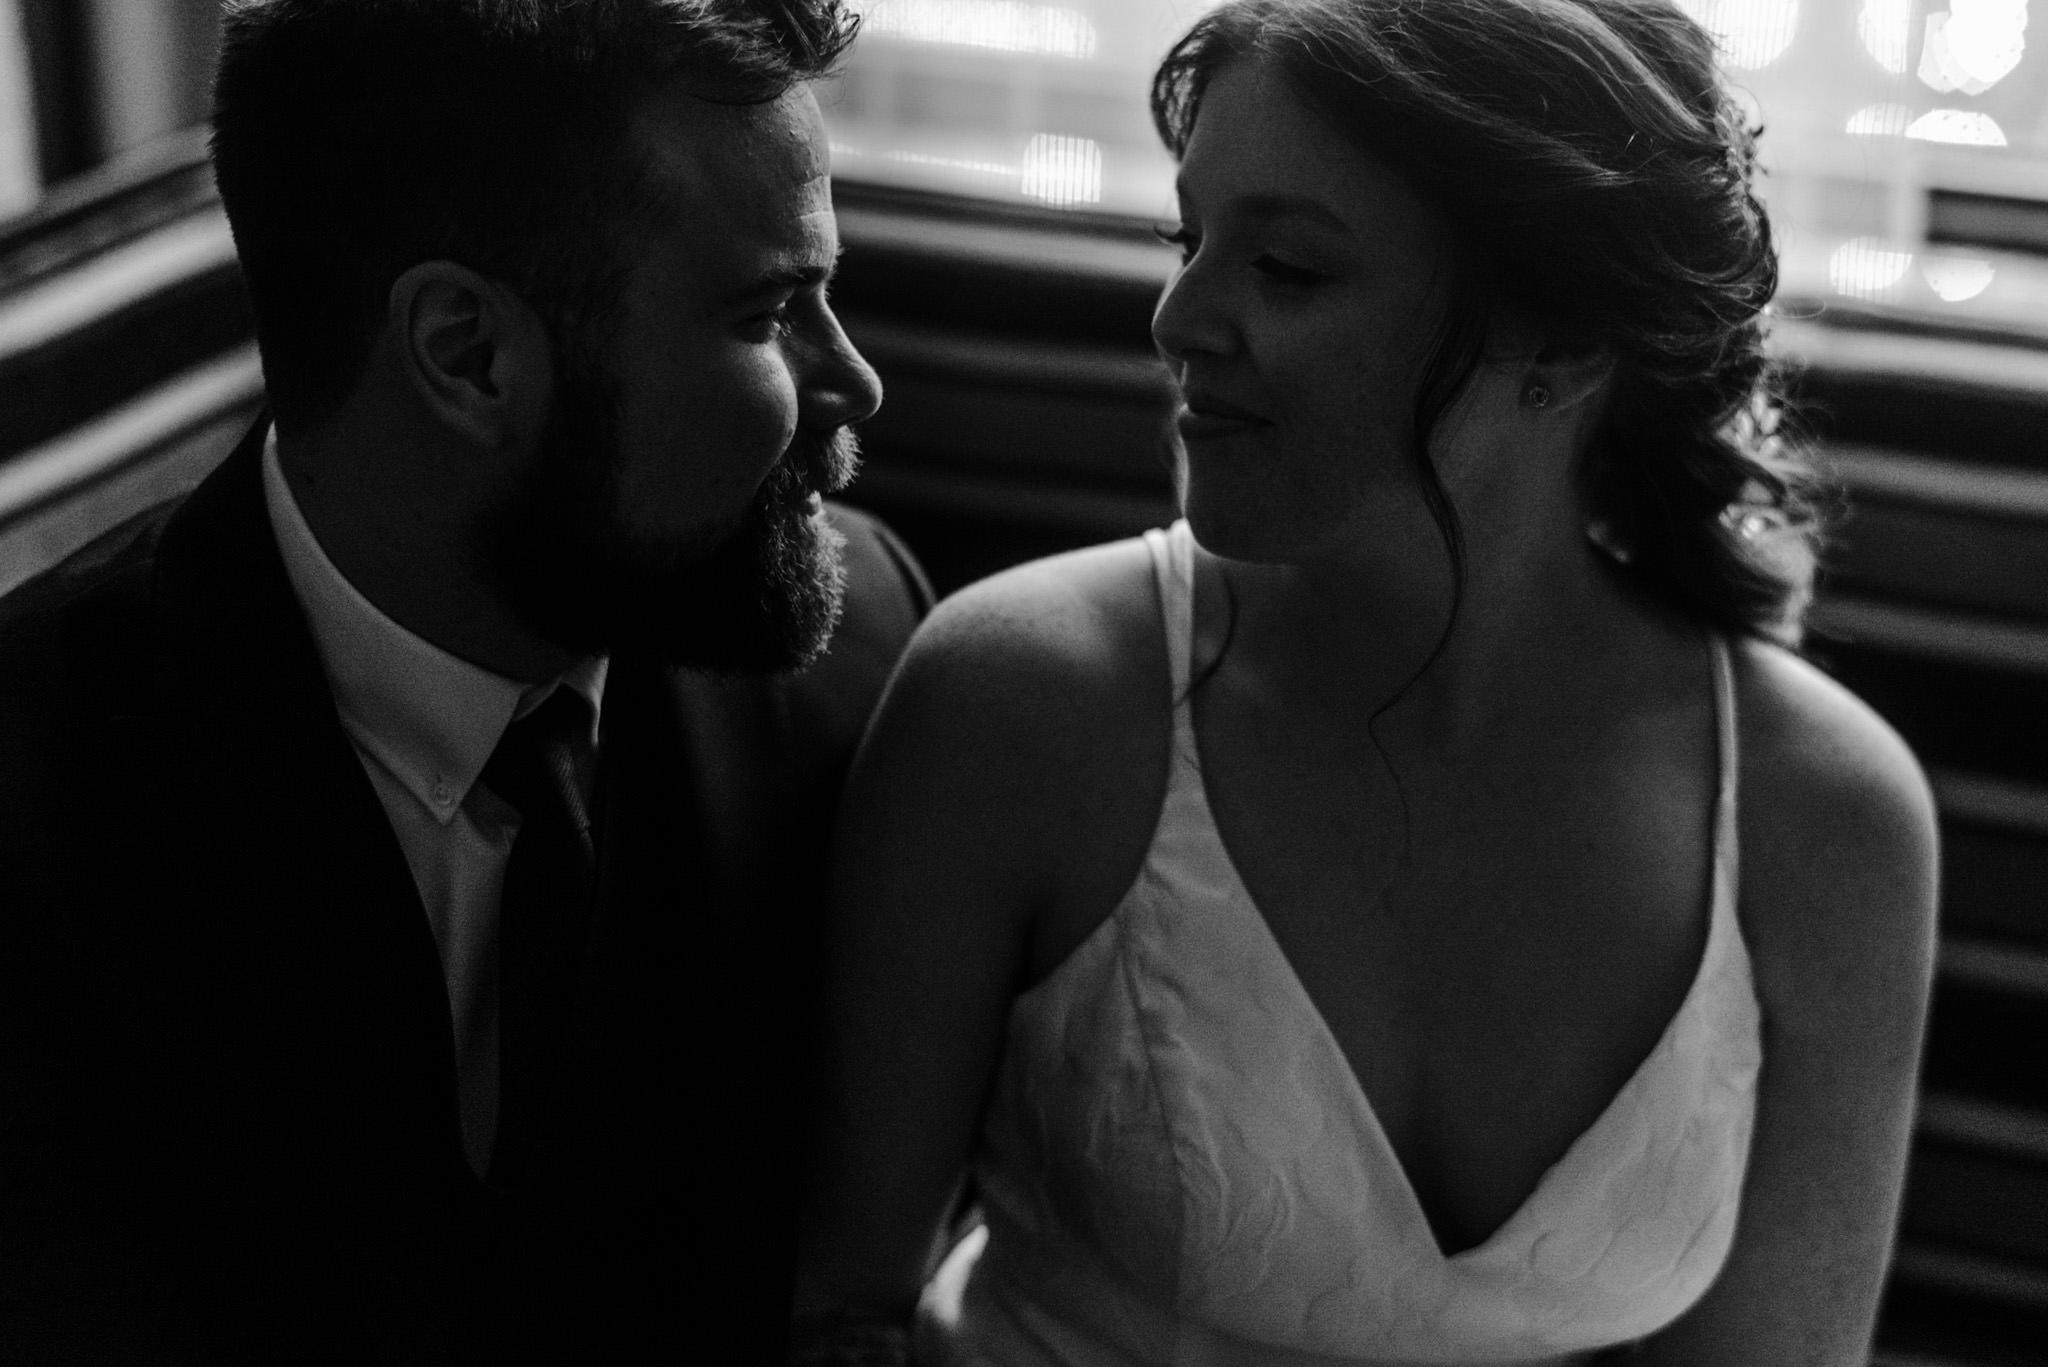 132-wedding-couple-getting-ready-toronto-hotel-rainy-day-photographer.jpg